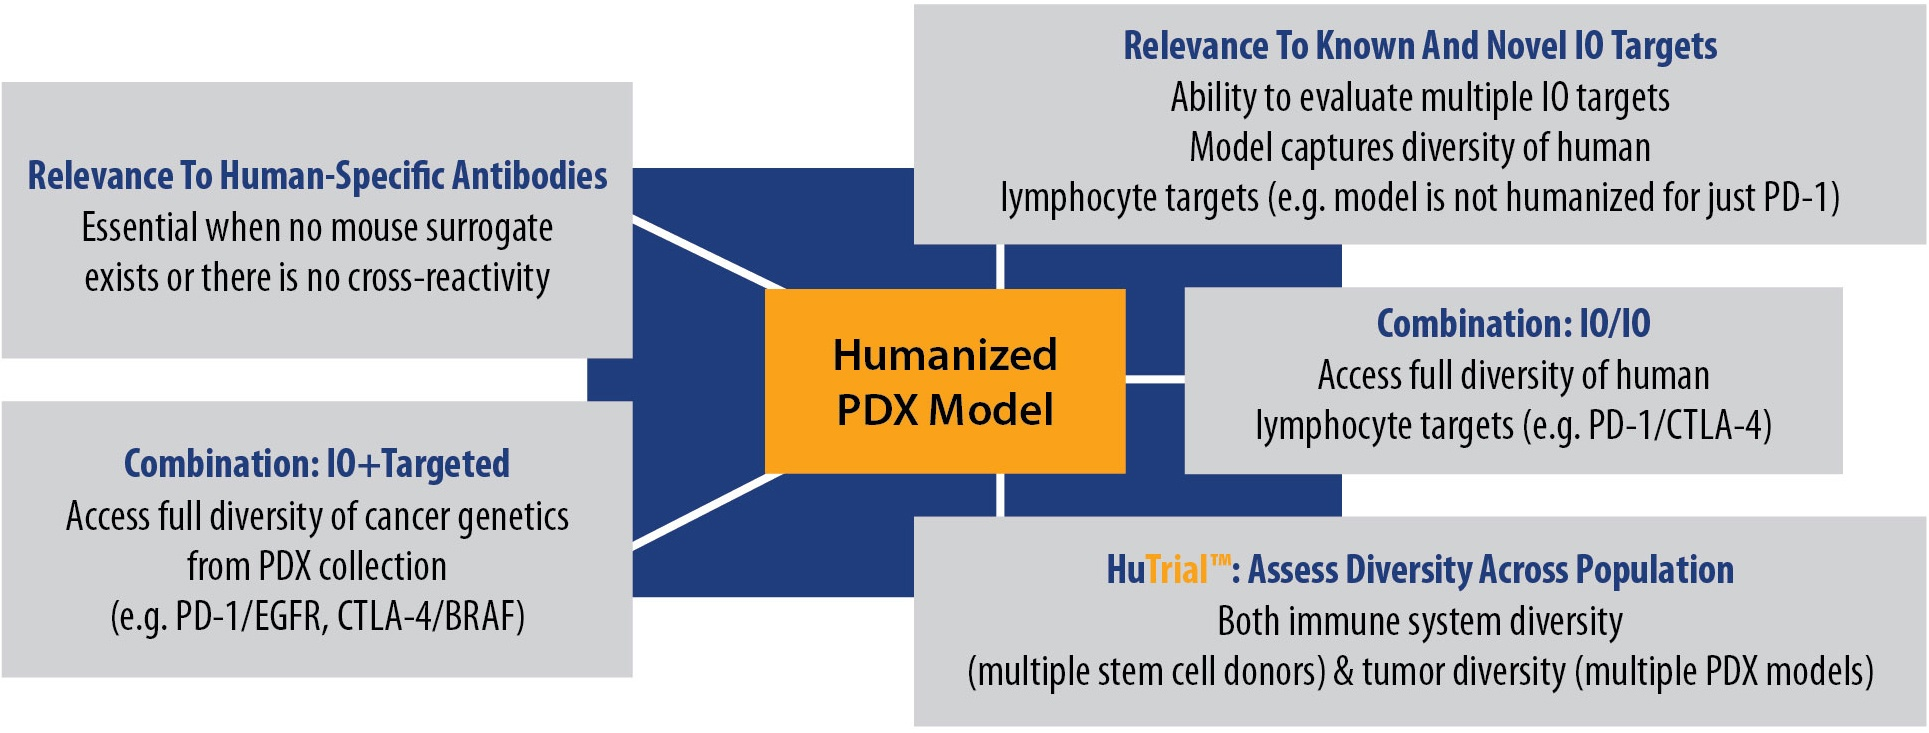 Advantages of Hematopoietic Stem Cell - PDX